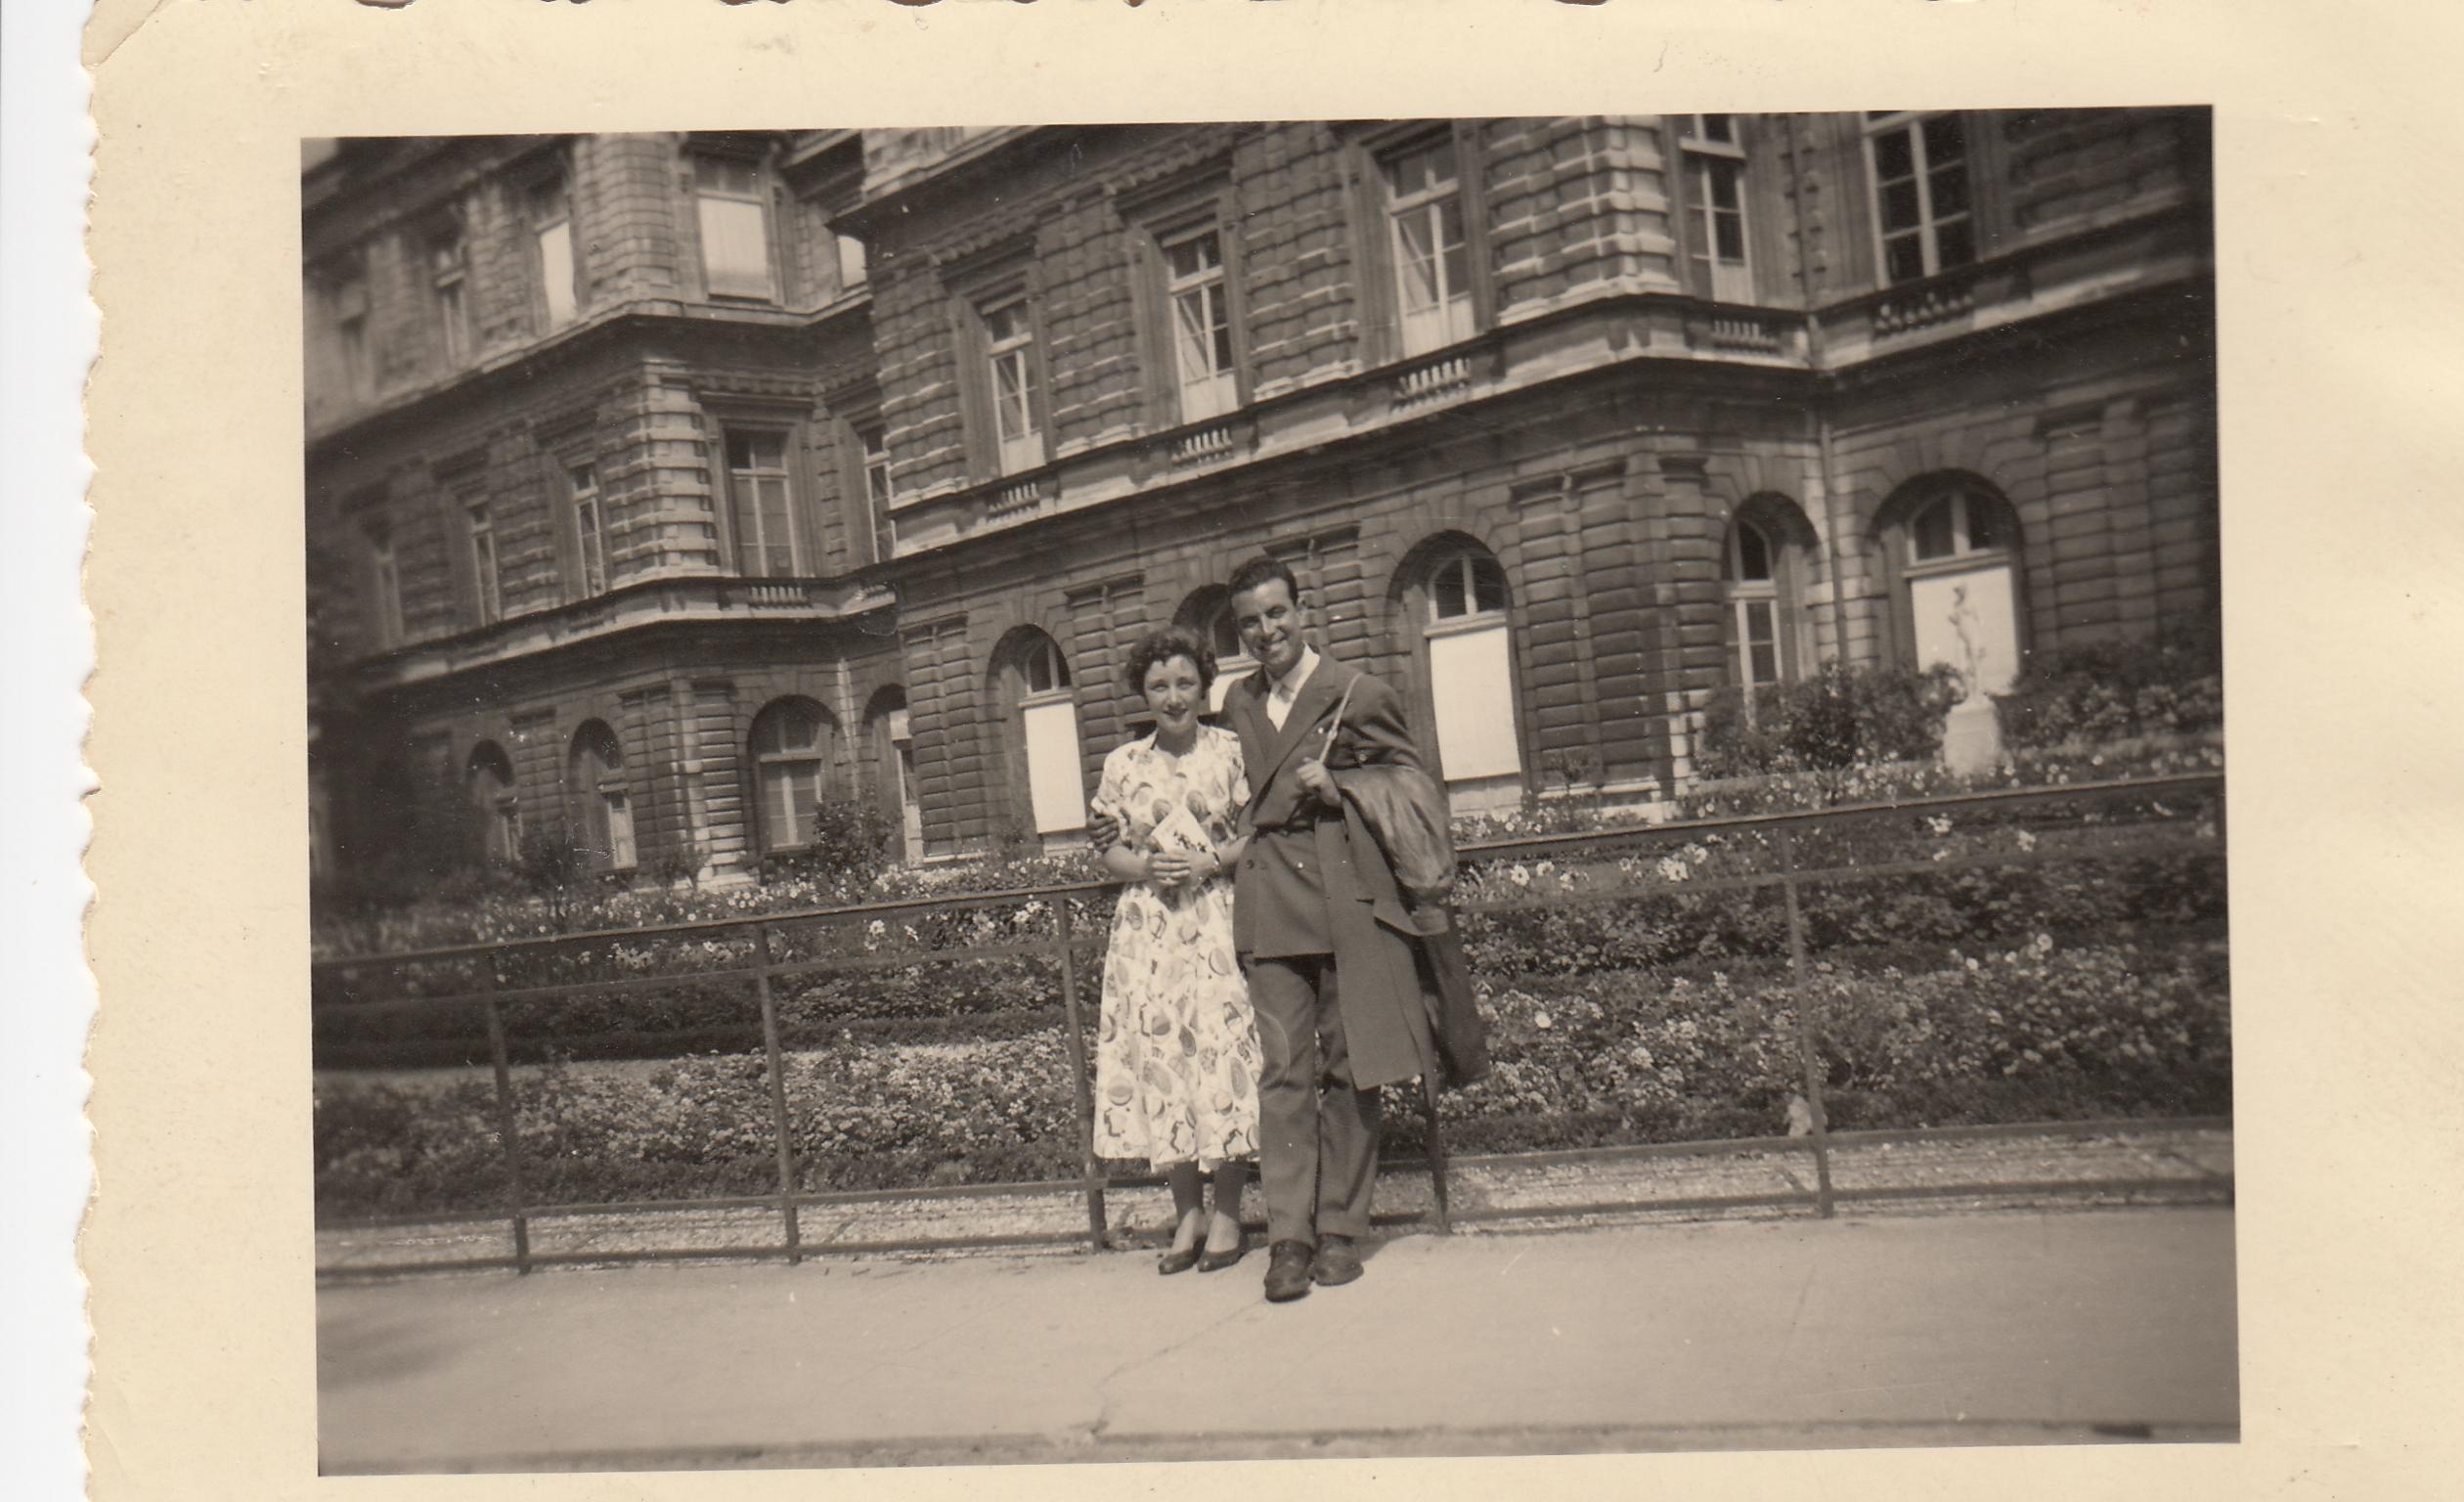 Ben_and_me_at_Palais_de_Luxembourg-Paris_August_1955.jpg